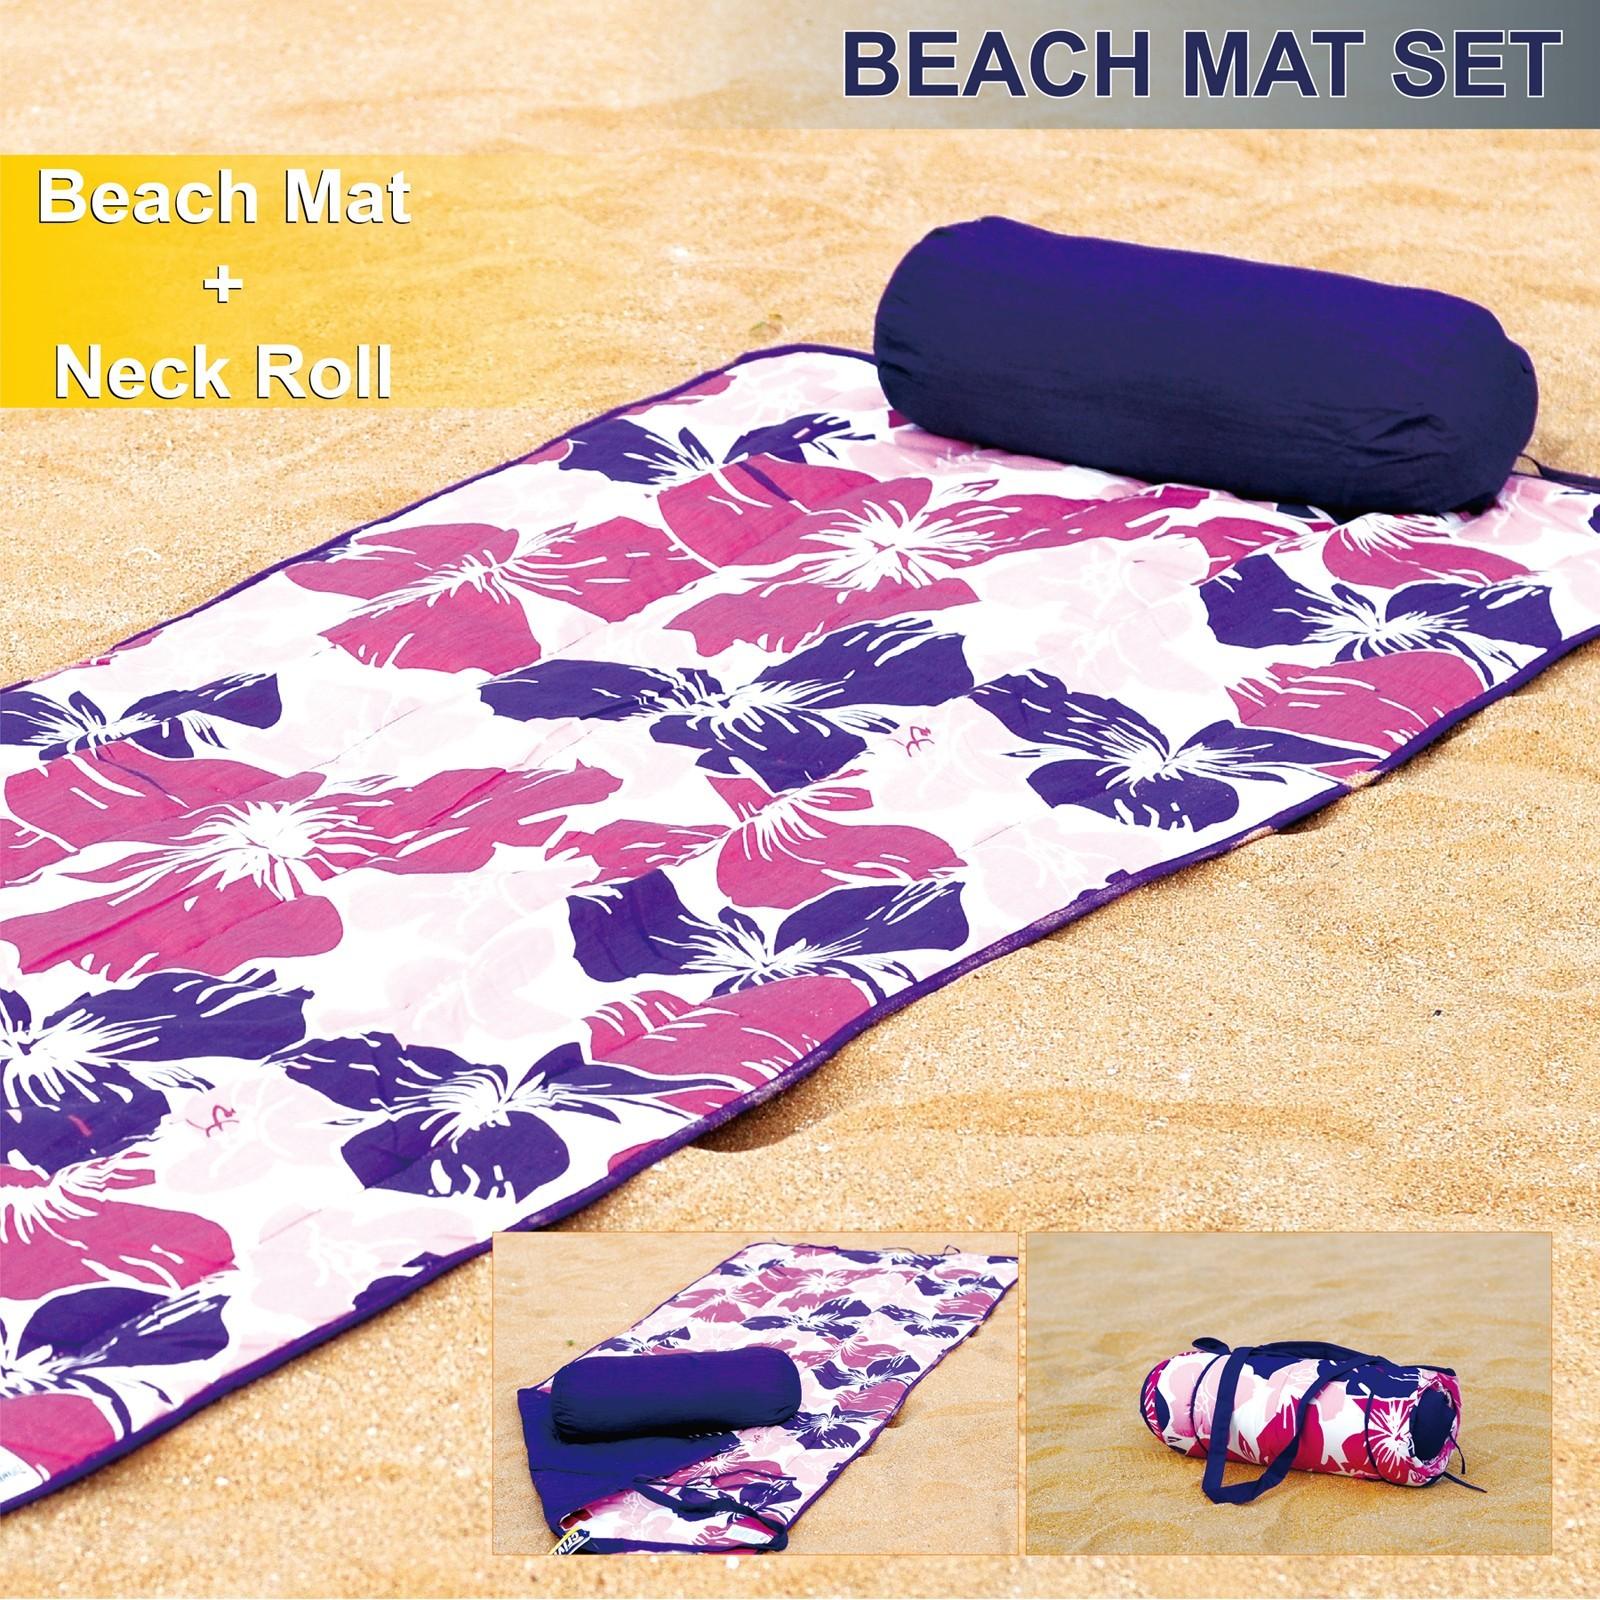 Roll-Up Reversible Beach Mat with Neck Pillow Purple Flower